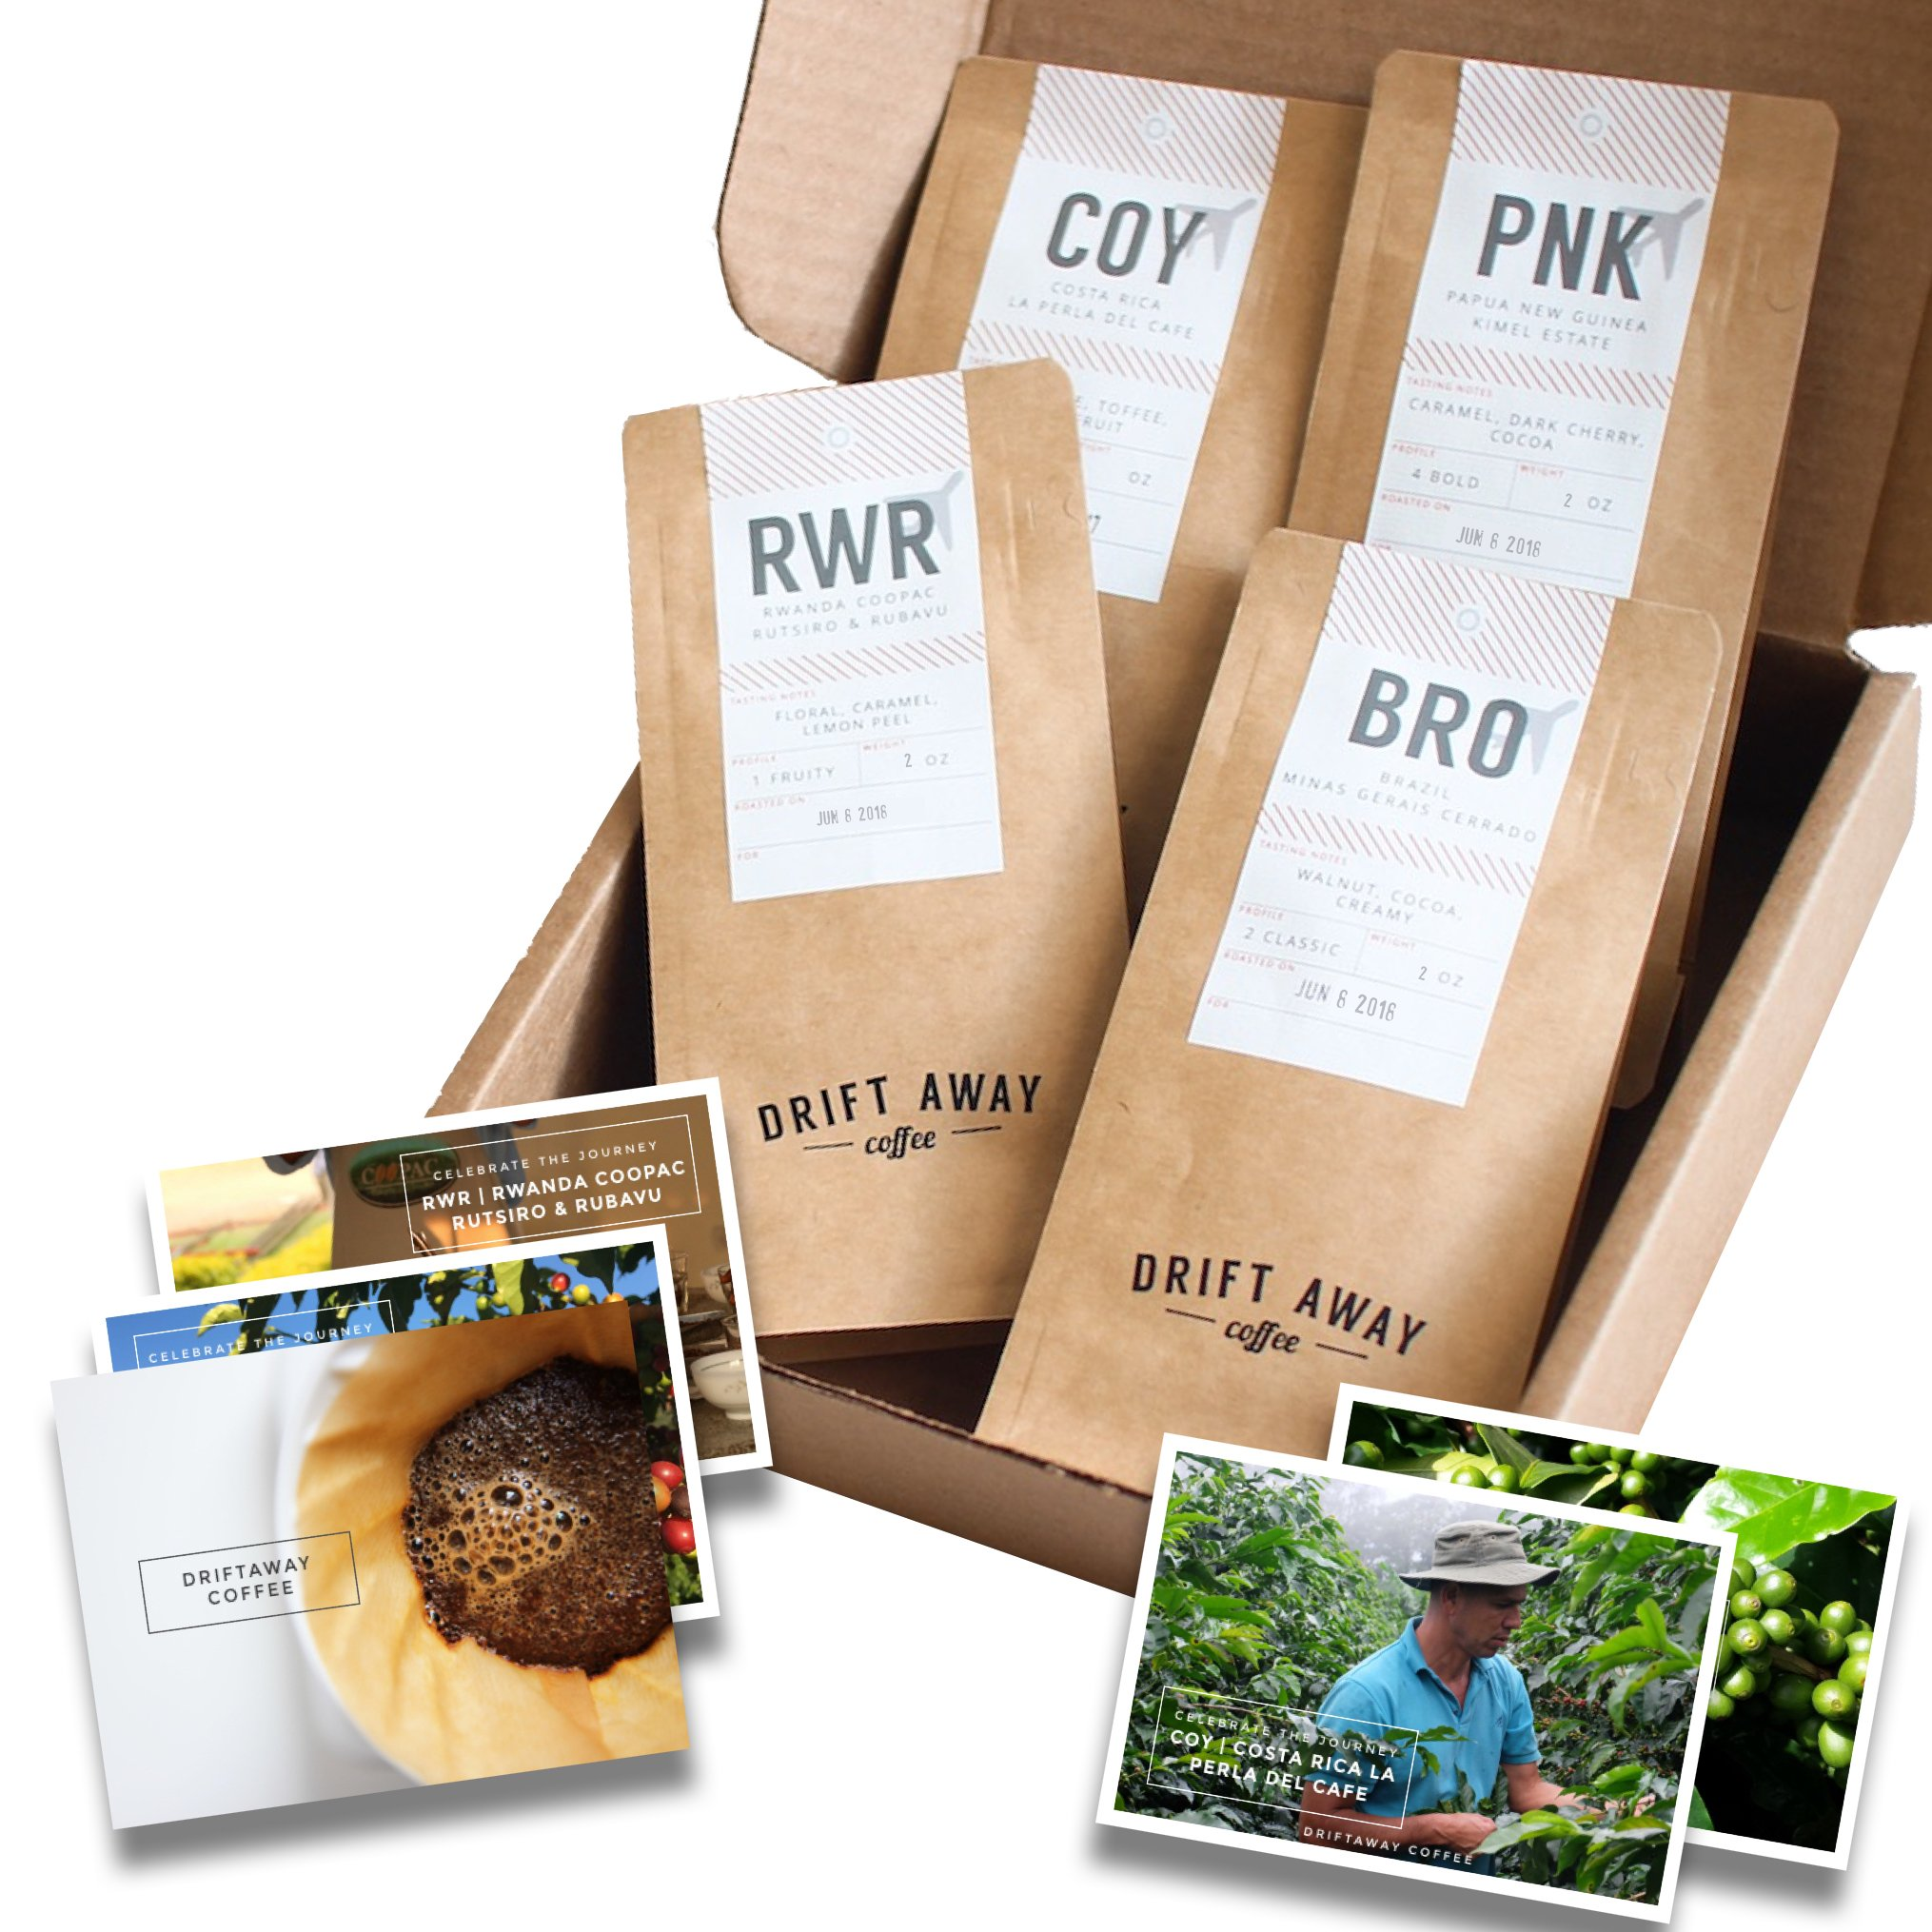 Driftaway Coffee - Coffee Subscription, Fresh Roasted Whole Bean Coffee (7 oz - 3 Months)